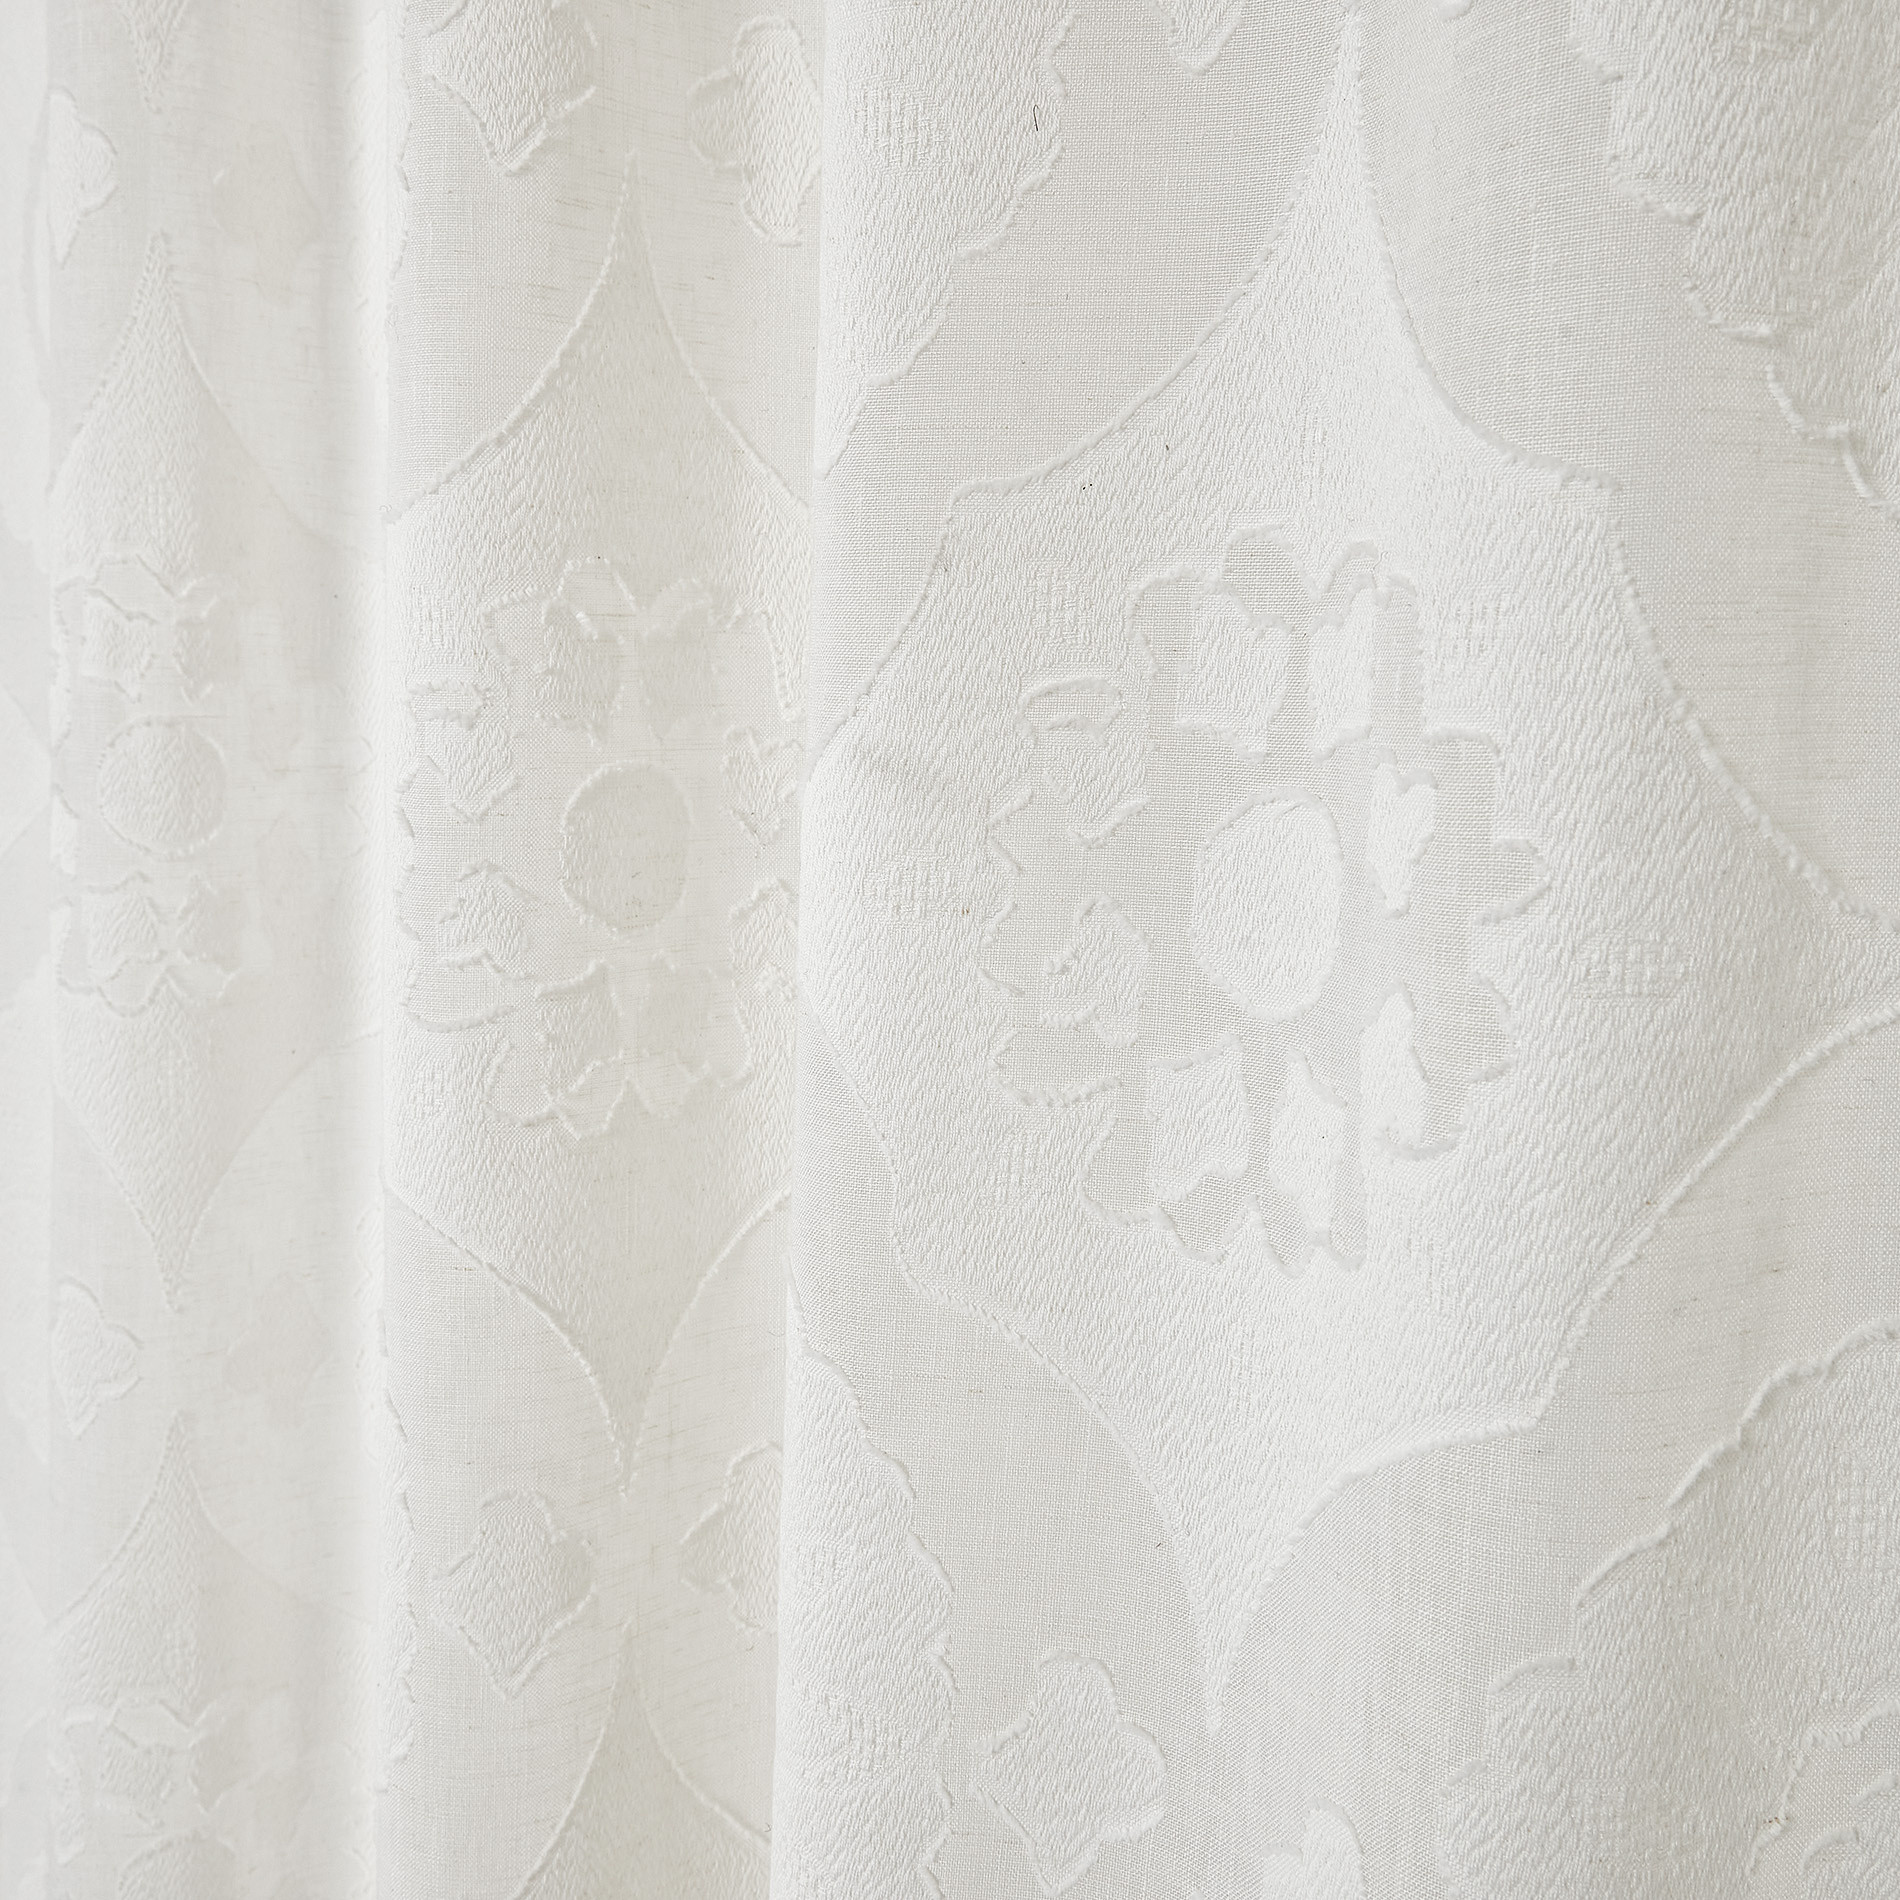 Tenda devore motivo geometrico passanti nascosti, Bianco, large image number 0